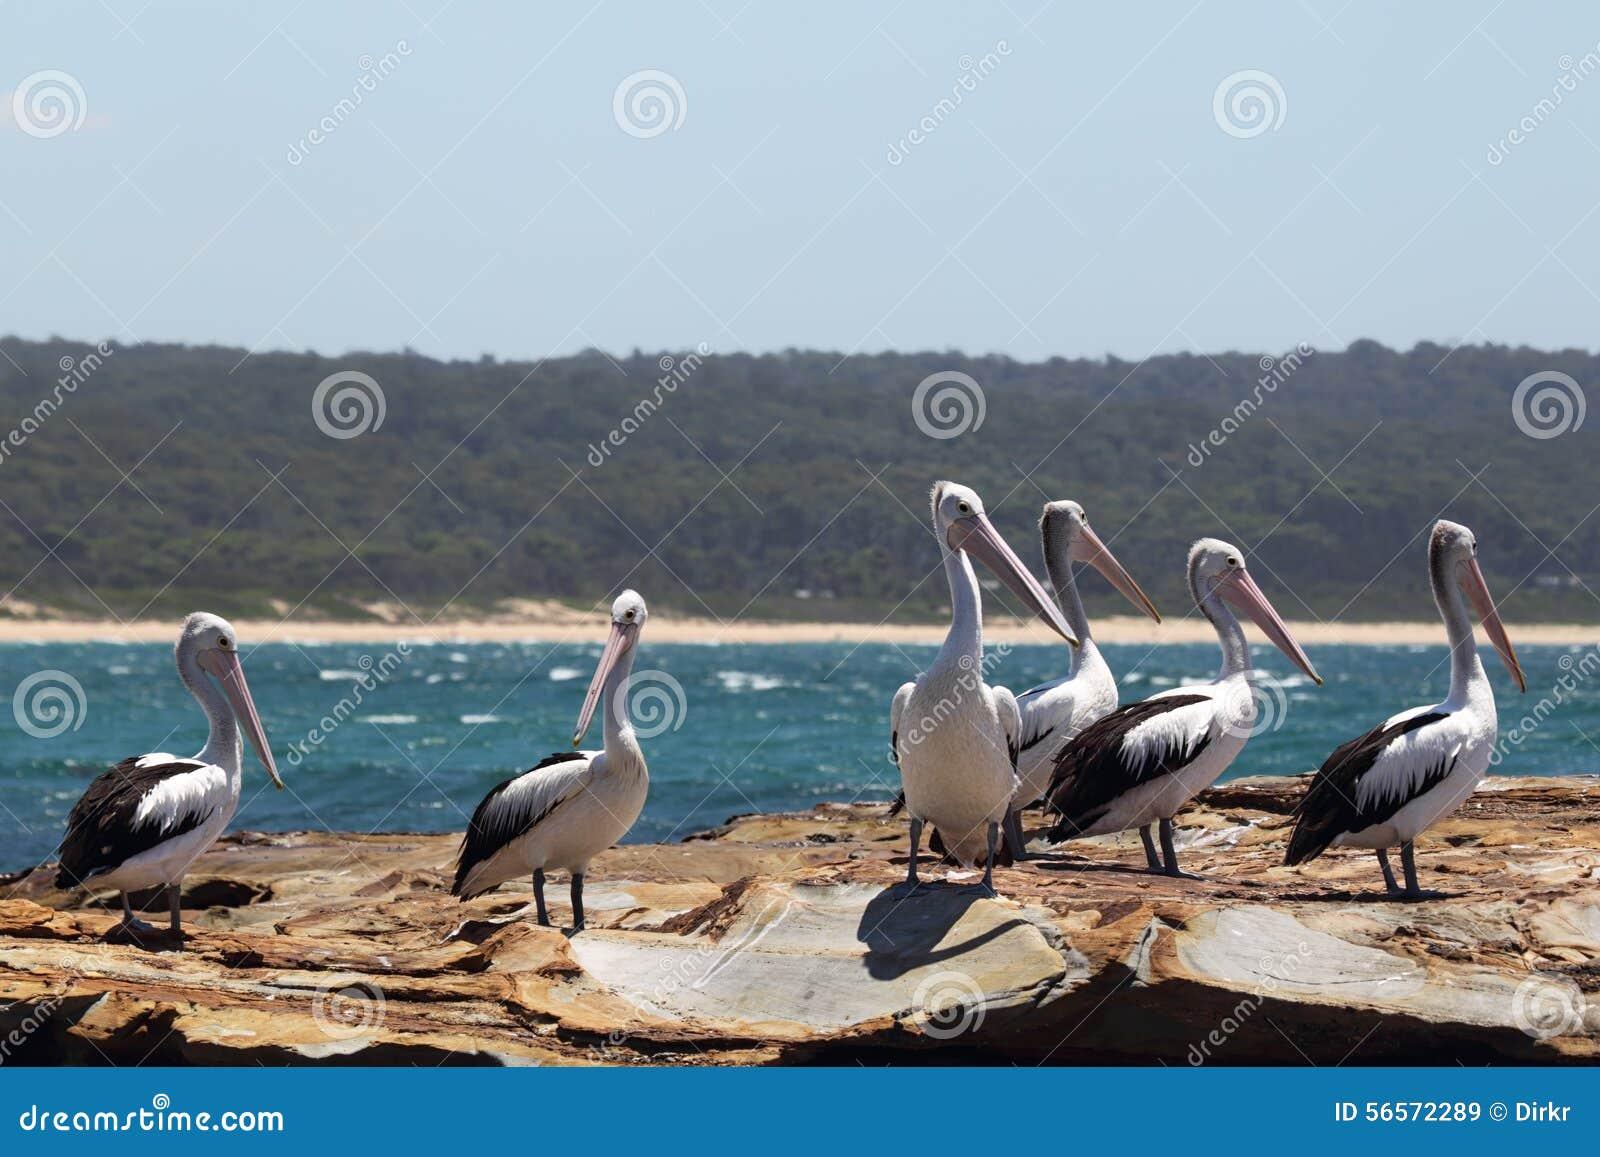 Download αυστραλιανοί πελεκάνοι Pelecanus Conspicillatus Στοκ Εικόνα - εικόνα από birdbaths, πελεκάνος: 56572289